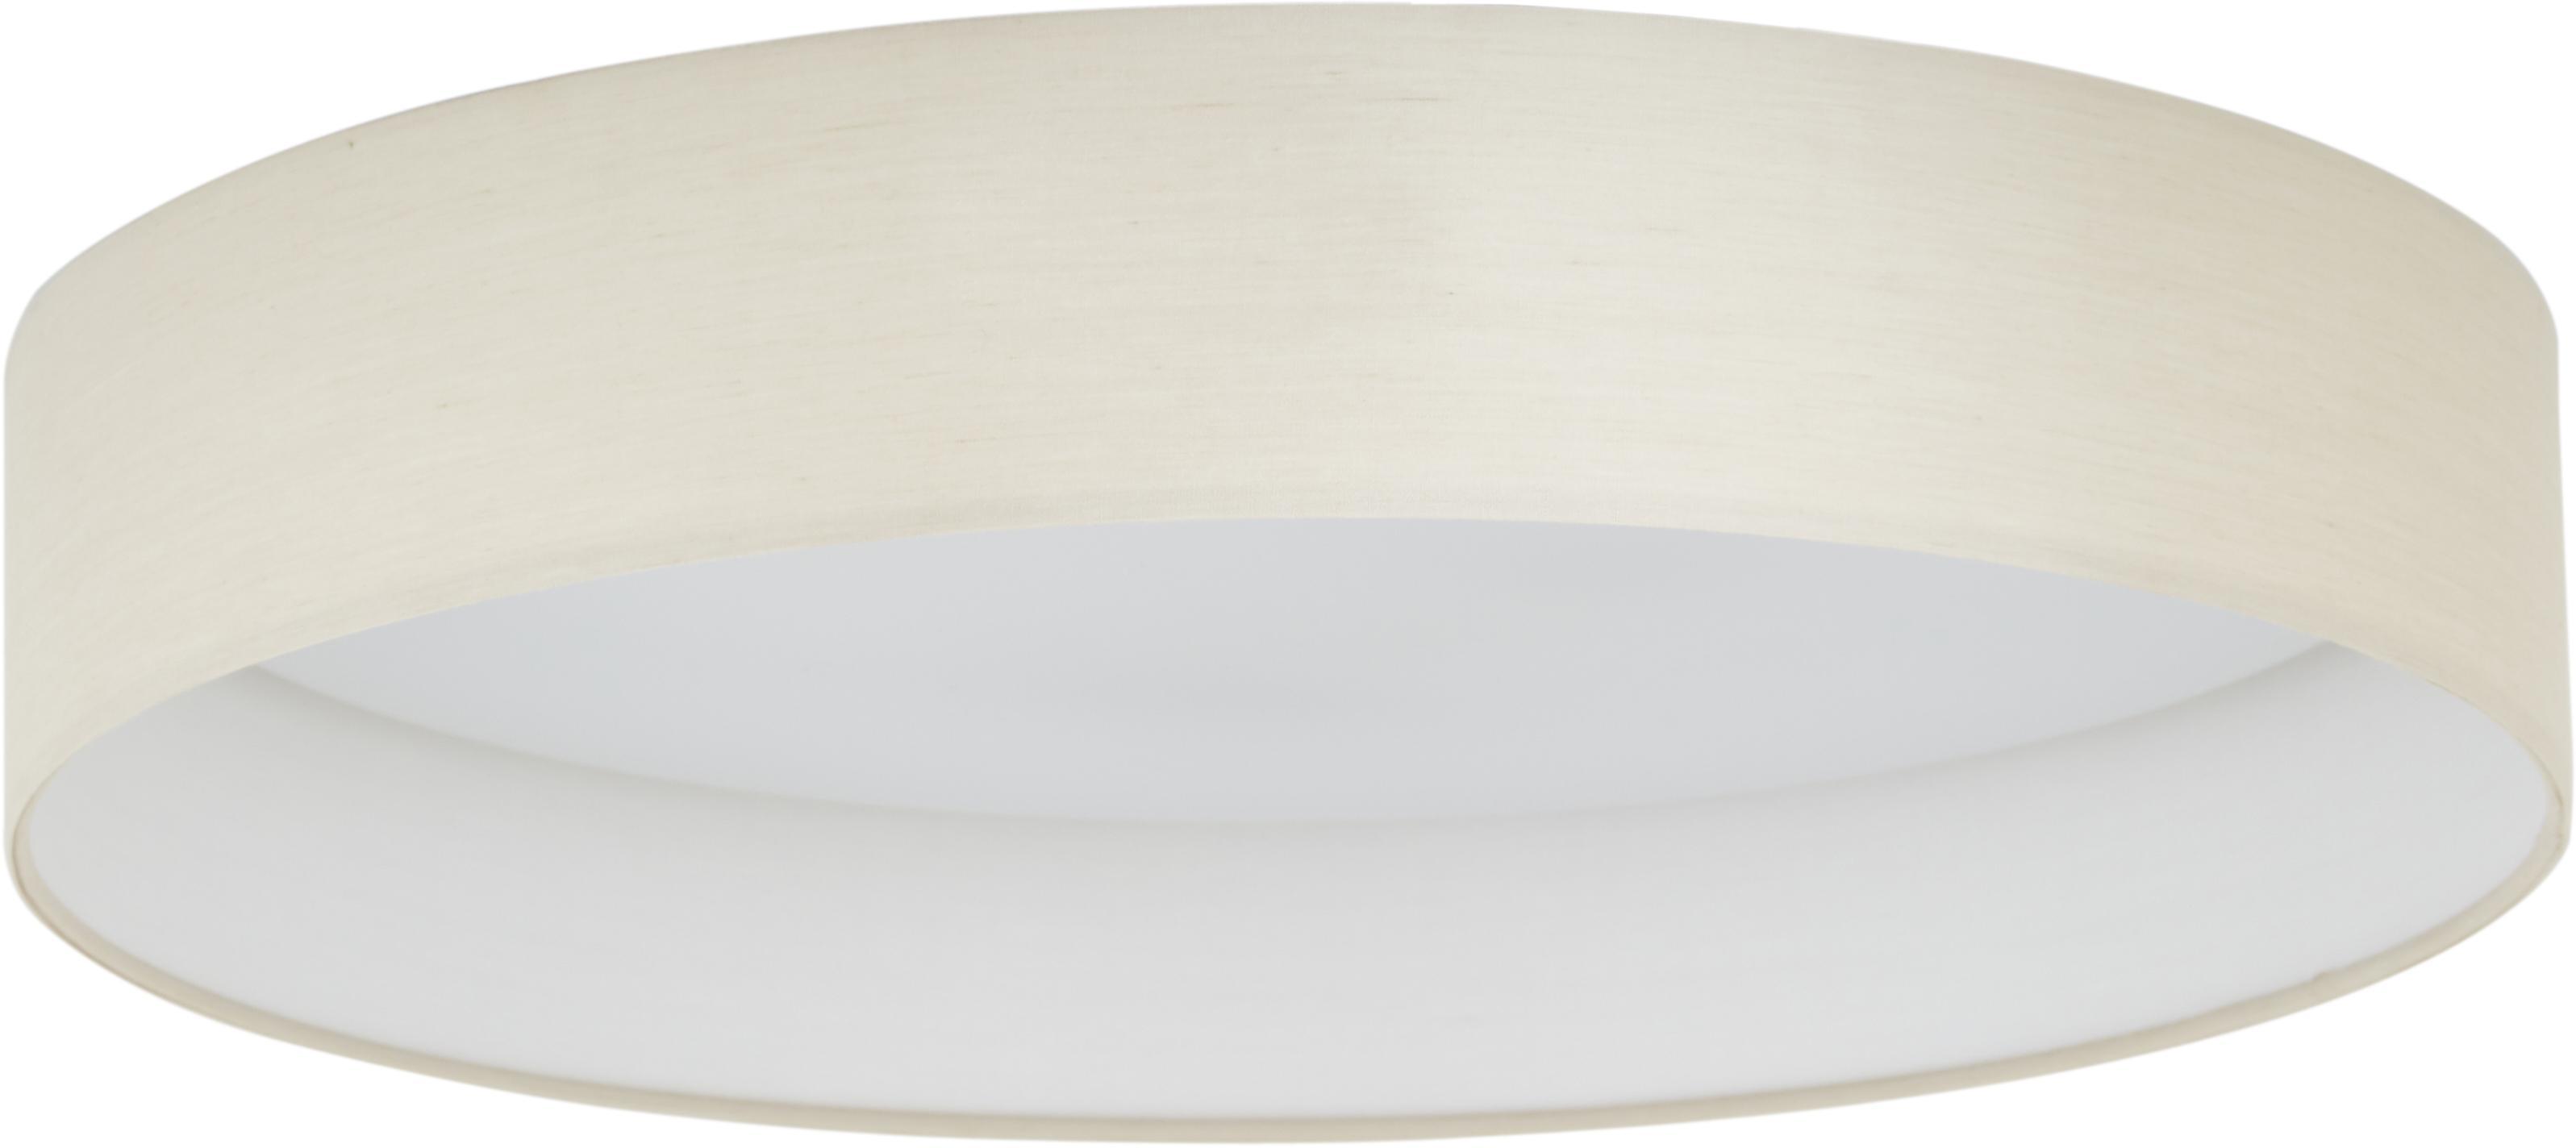 Plafoniera a LED Helen, Struttura: metallo, Taupe, Ø 52 x Alt. 11 cm